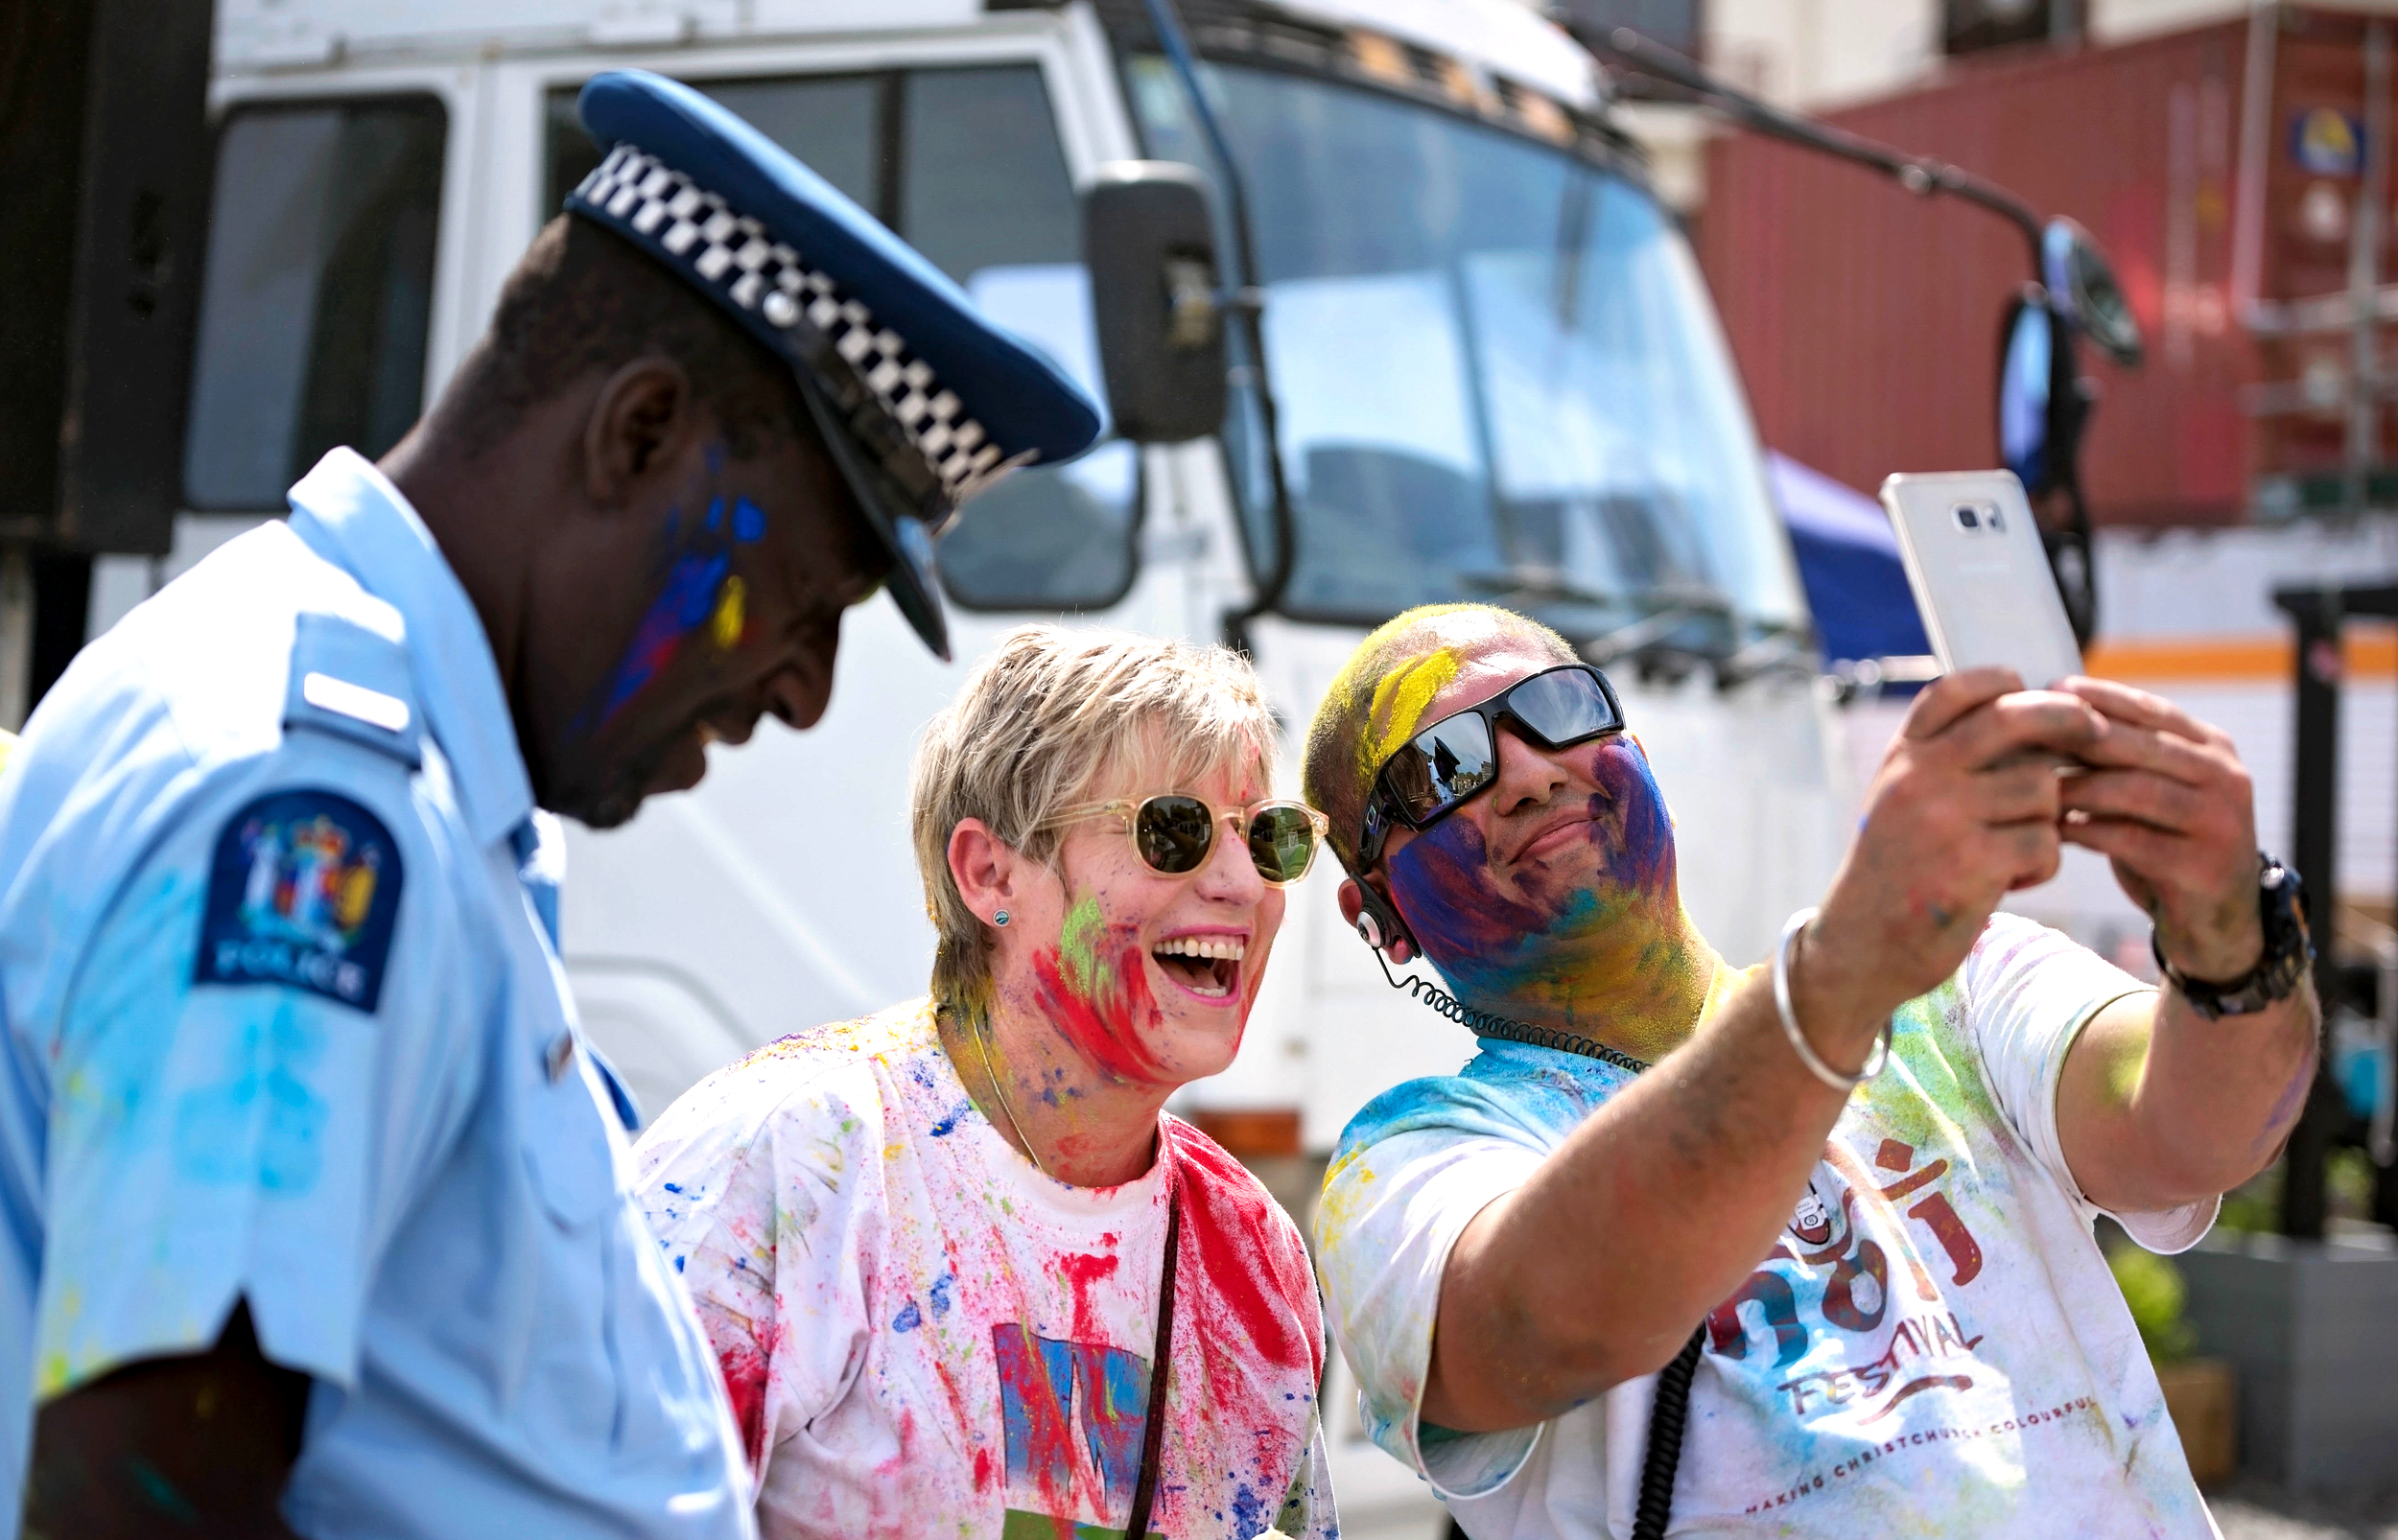 Constable Philemon Goto - Ethnic Liaison Officer of Canterbury Police, Christchurch's Mayor Lianne Dalziel and Hitesh Sharma, the main organiser of Christchurch's 2016 Holi celebrations